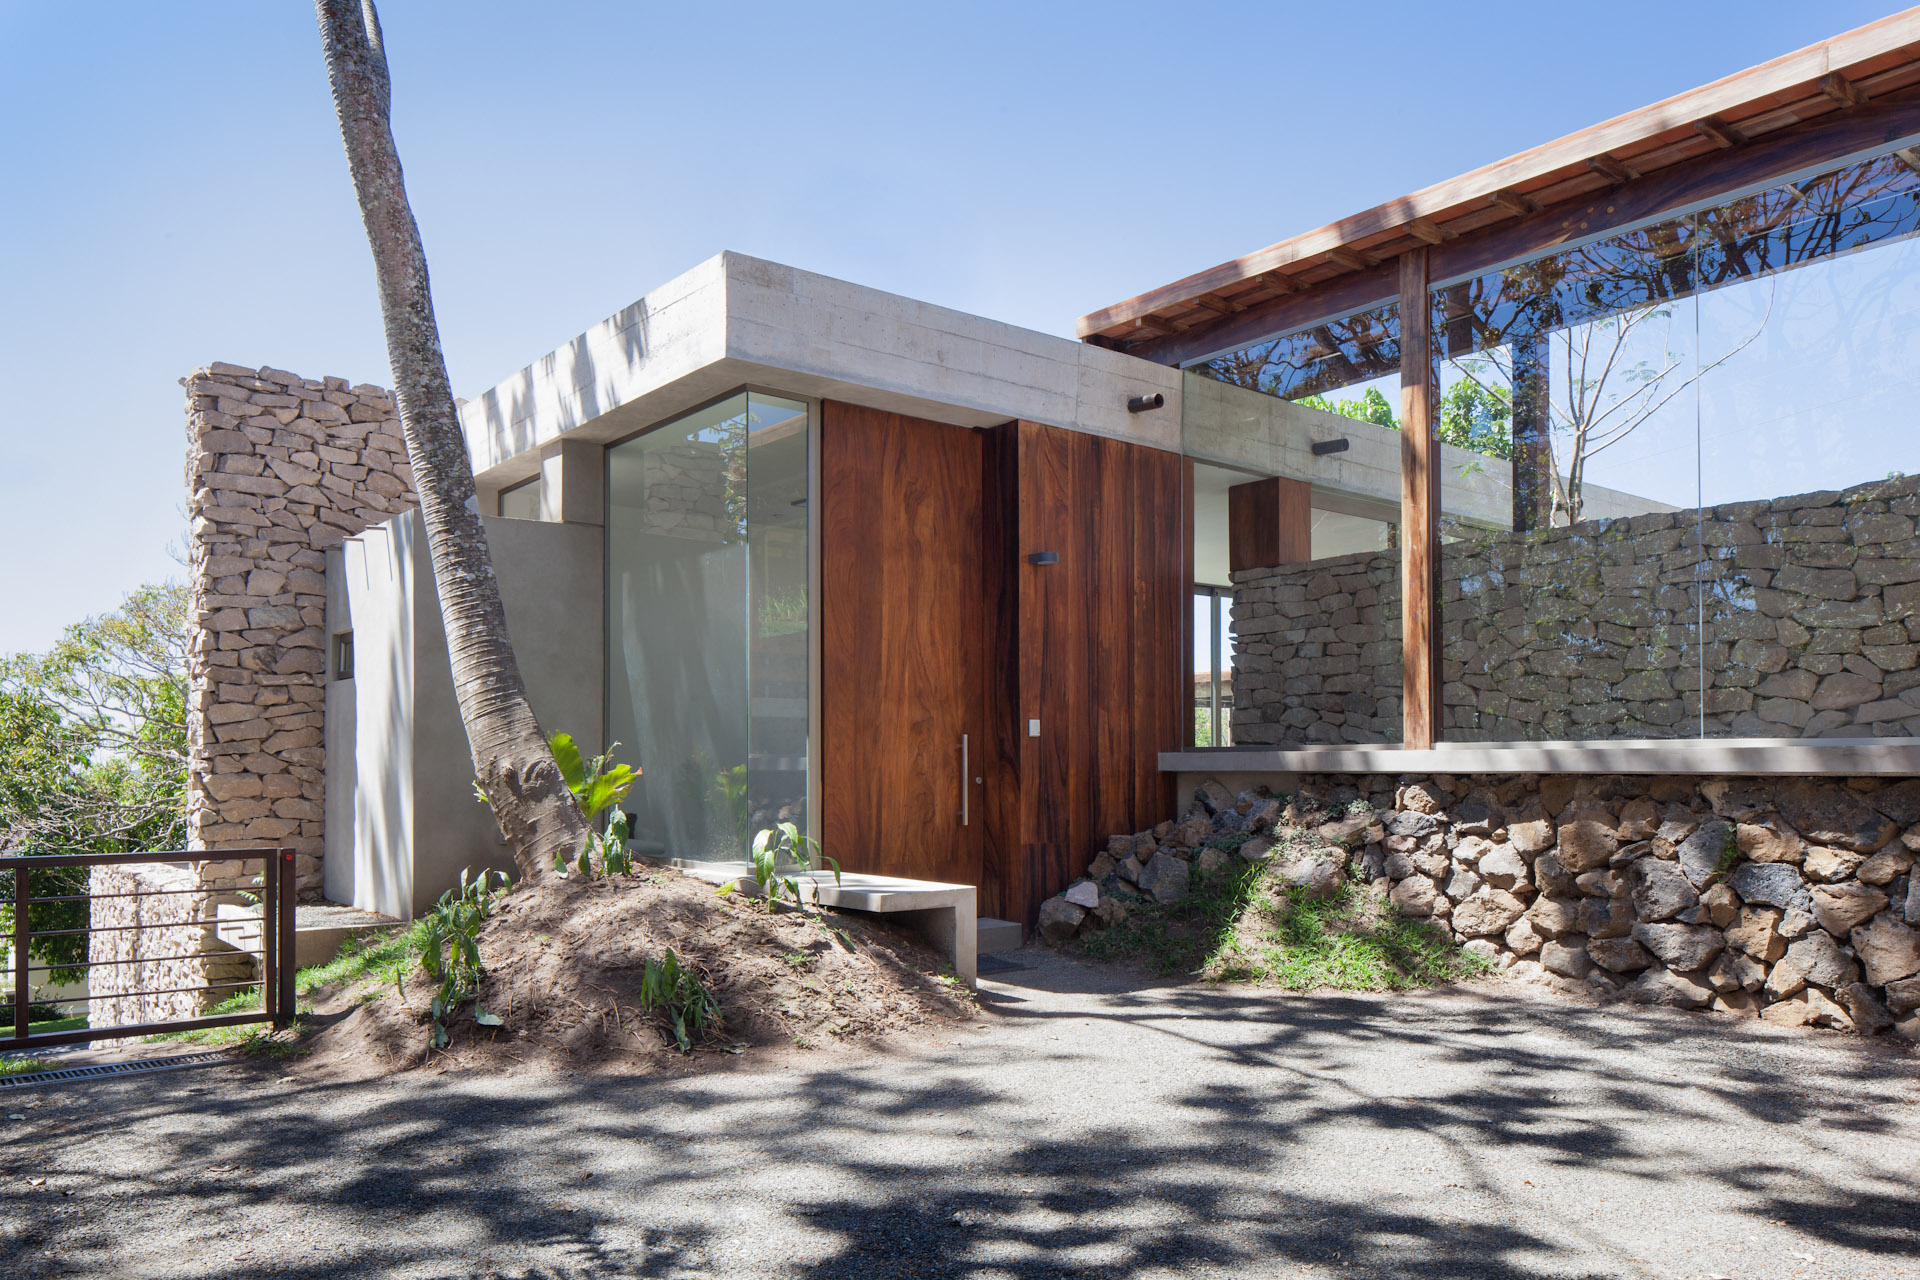 Architecture-Modern-Casa-Jardin-El-Salvador-Jason-Bax-03.JPG